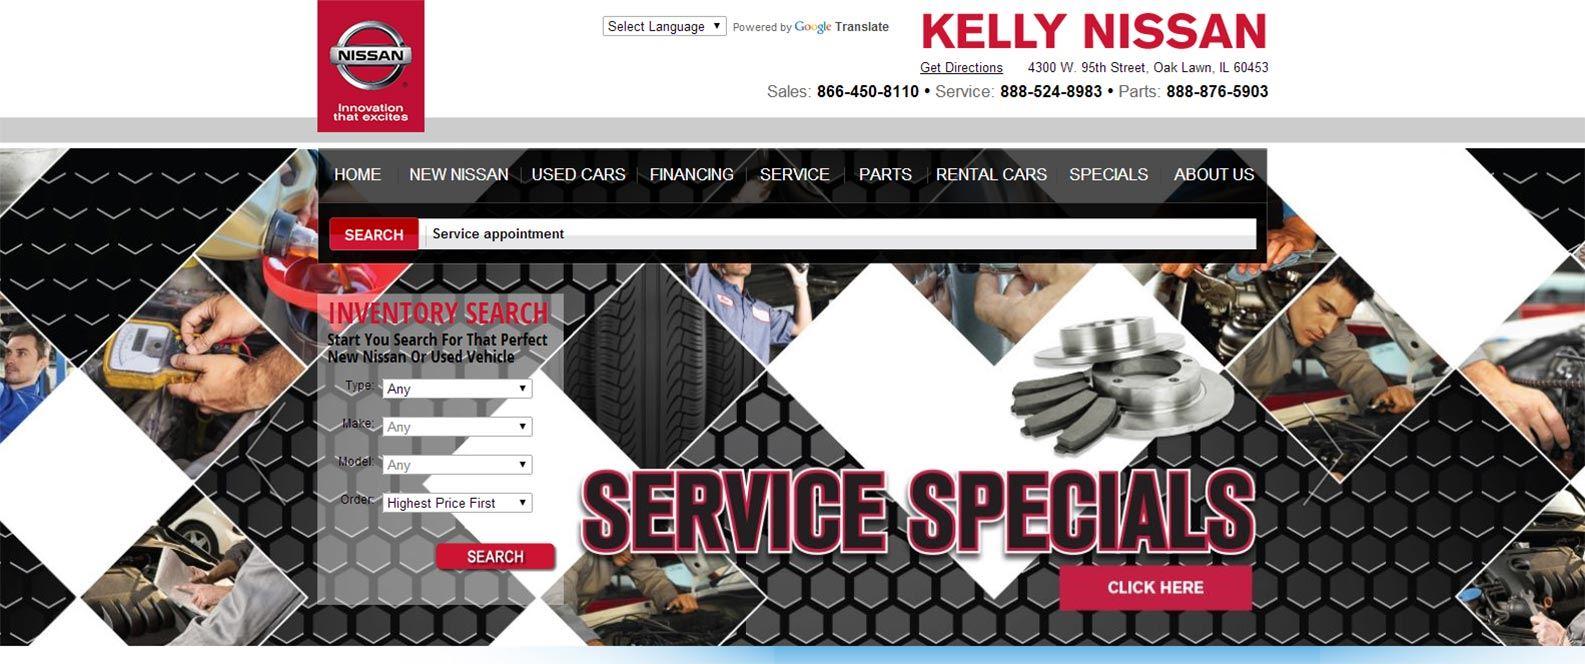 Kelly Nissan